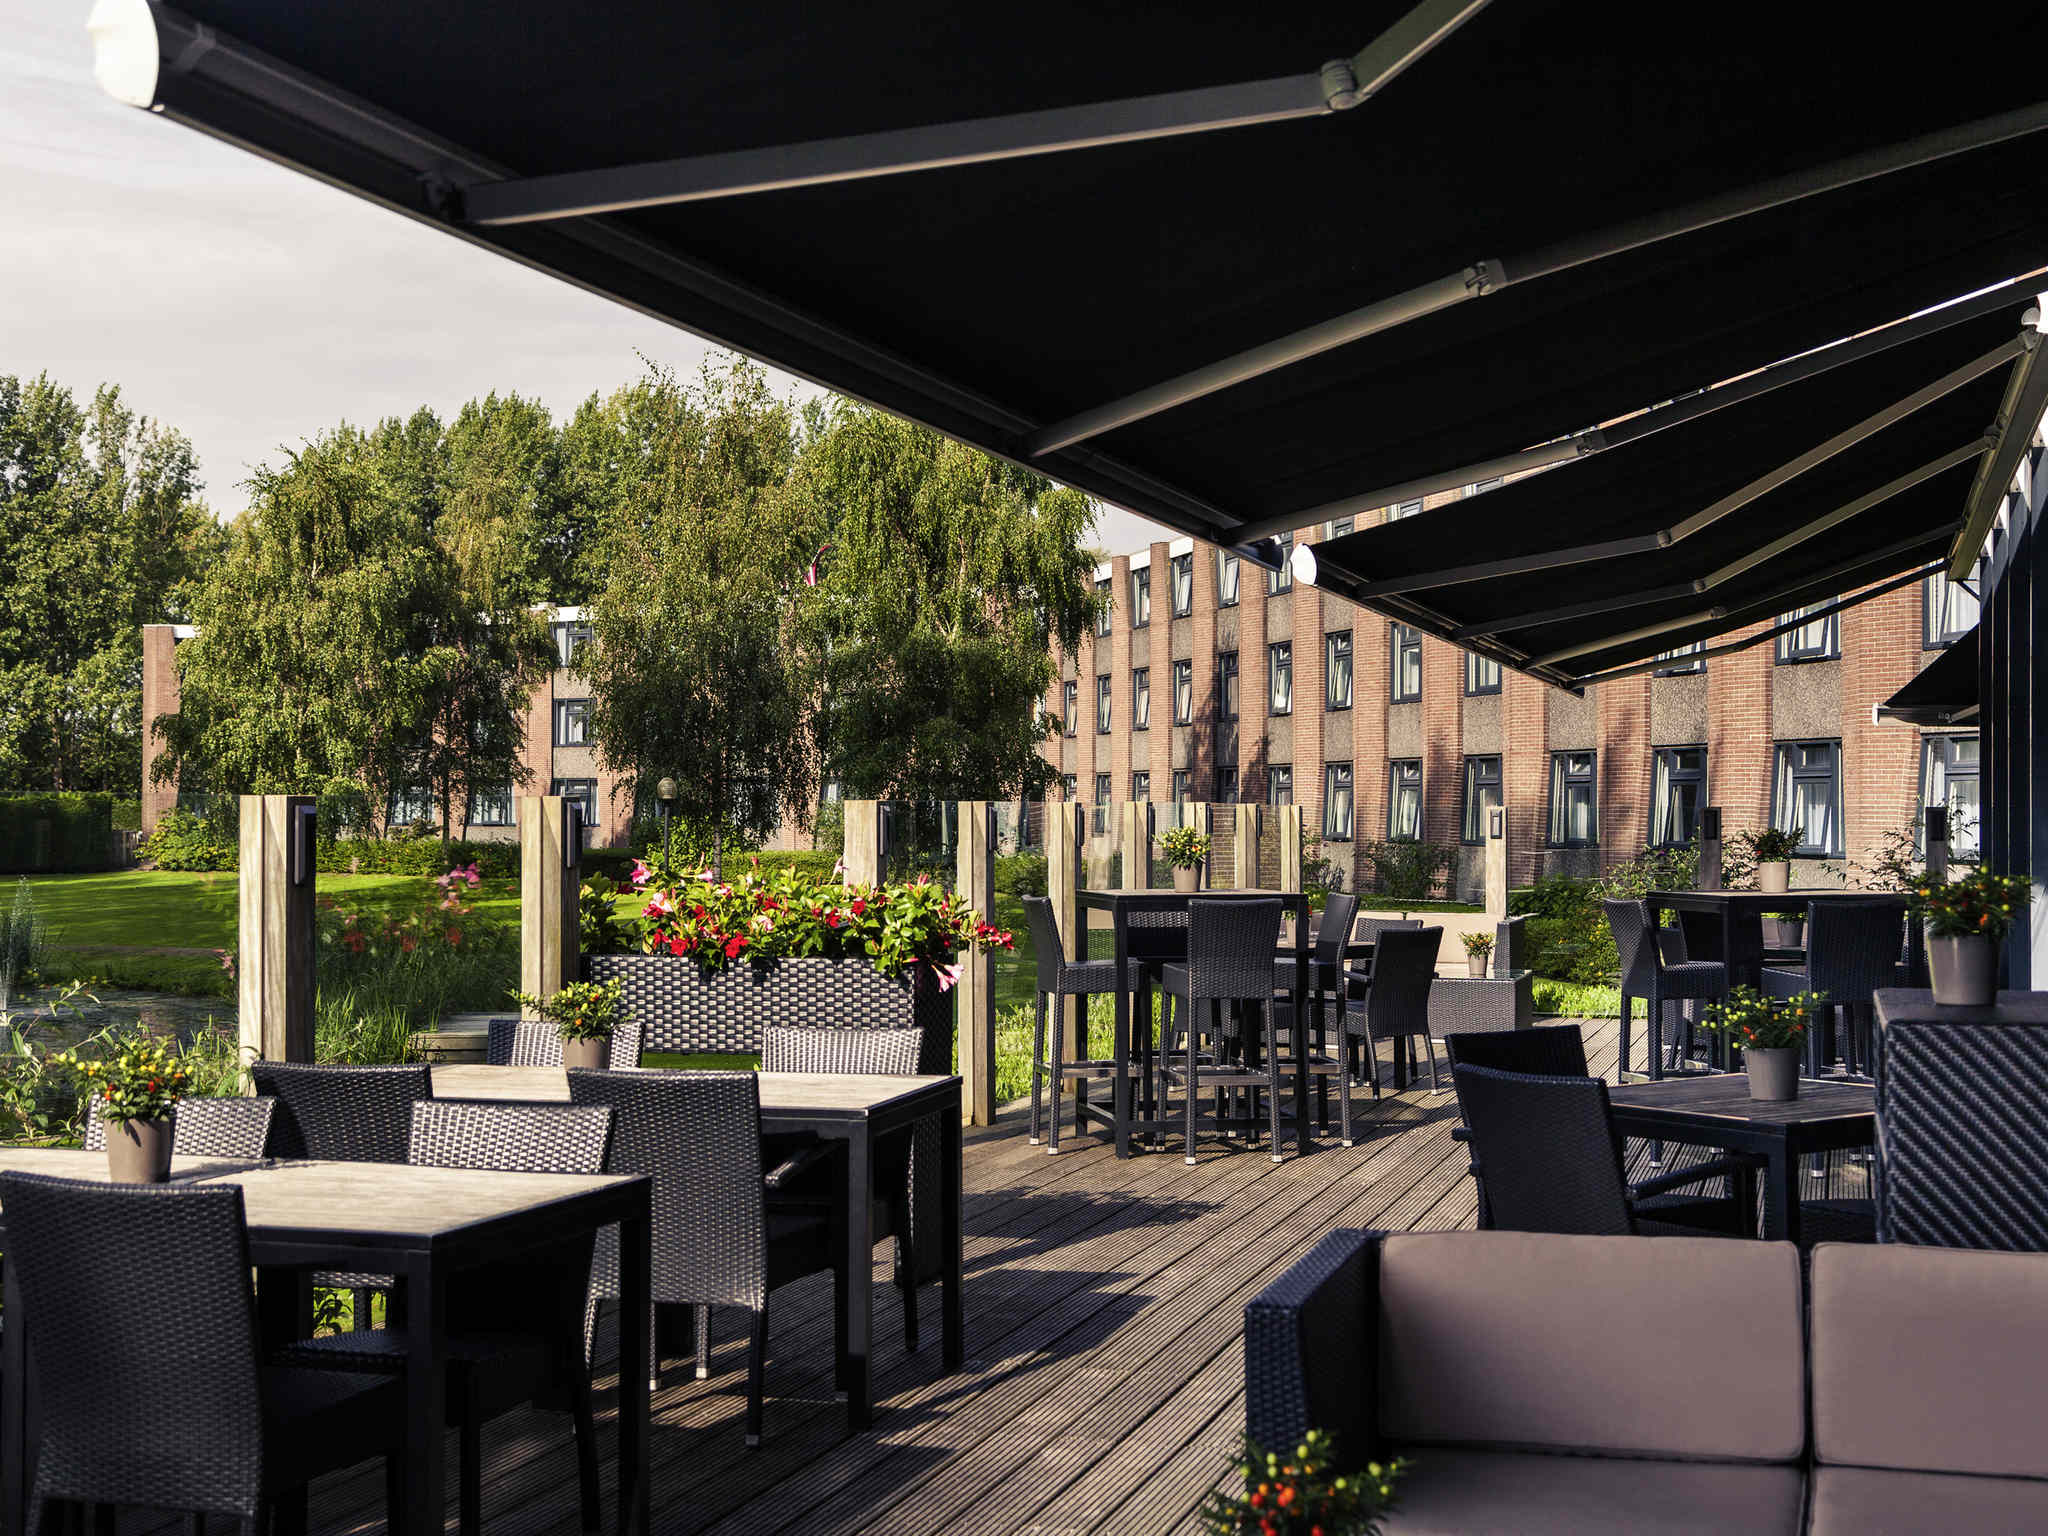 MERCURE HOTEL AMSTERDAM AIRPORT - 1315